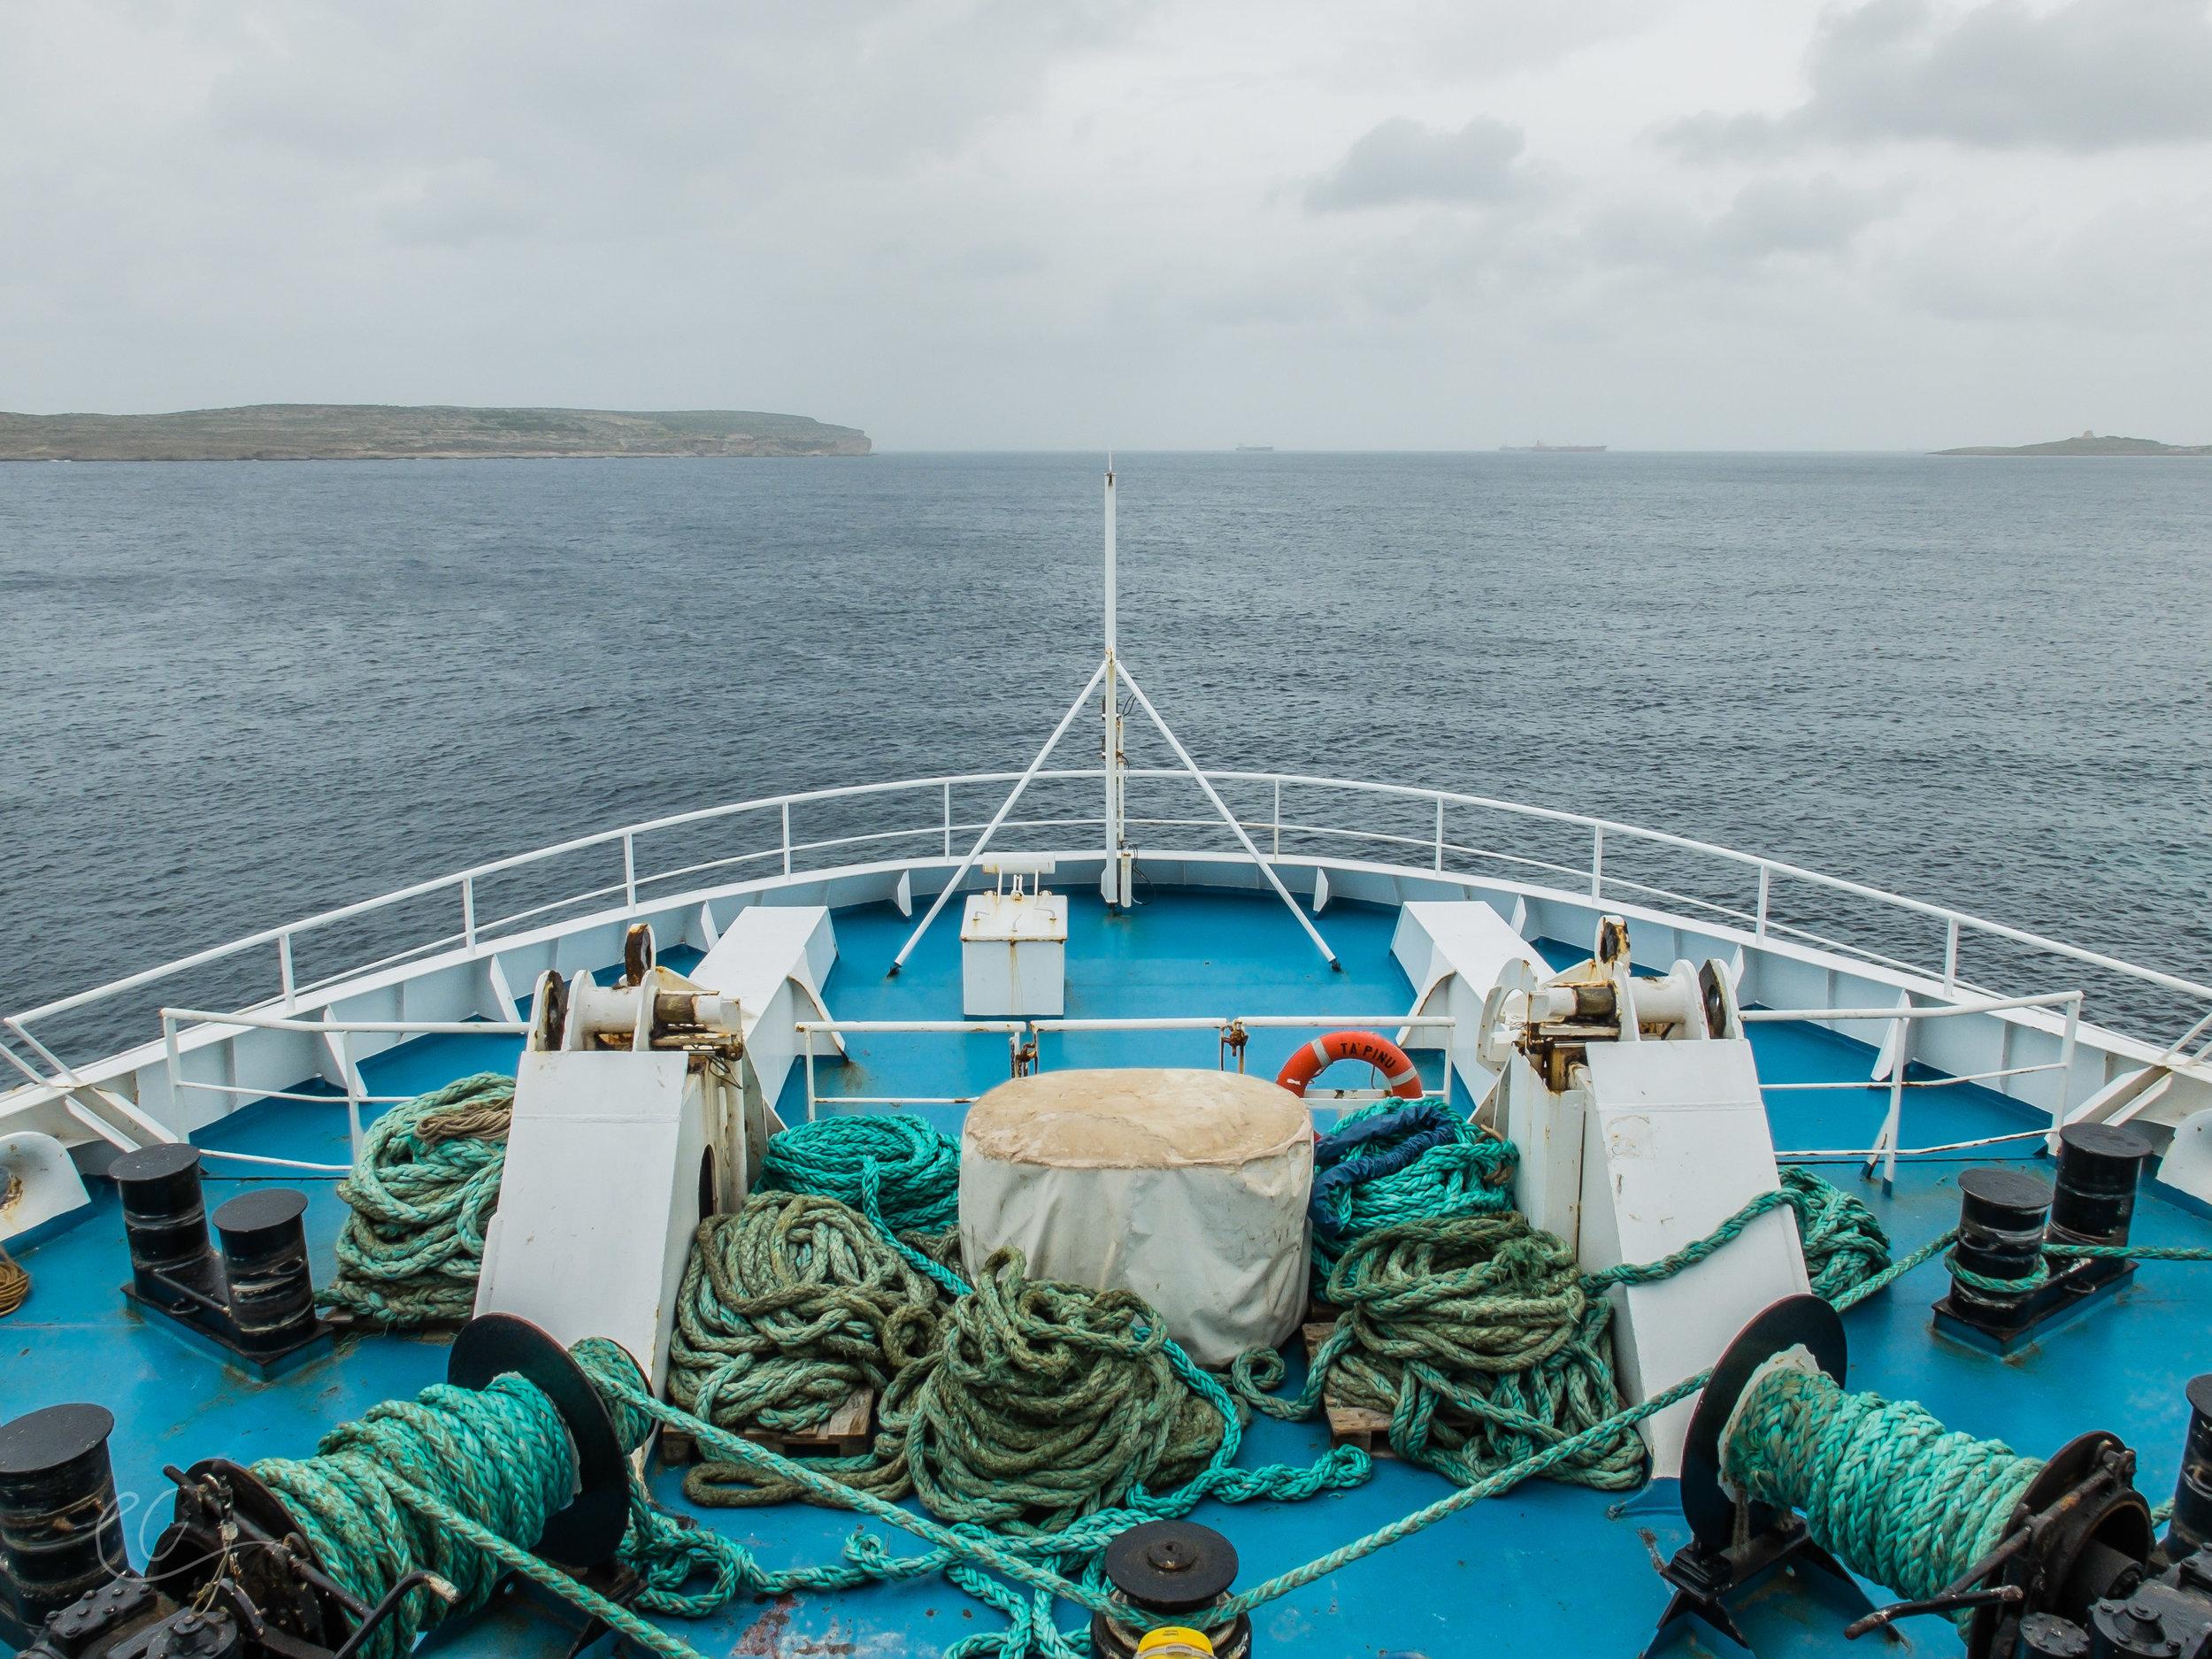 malta-travel-12.jpg